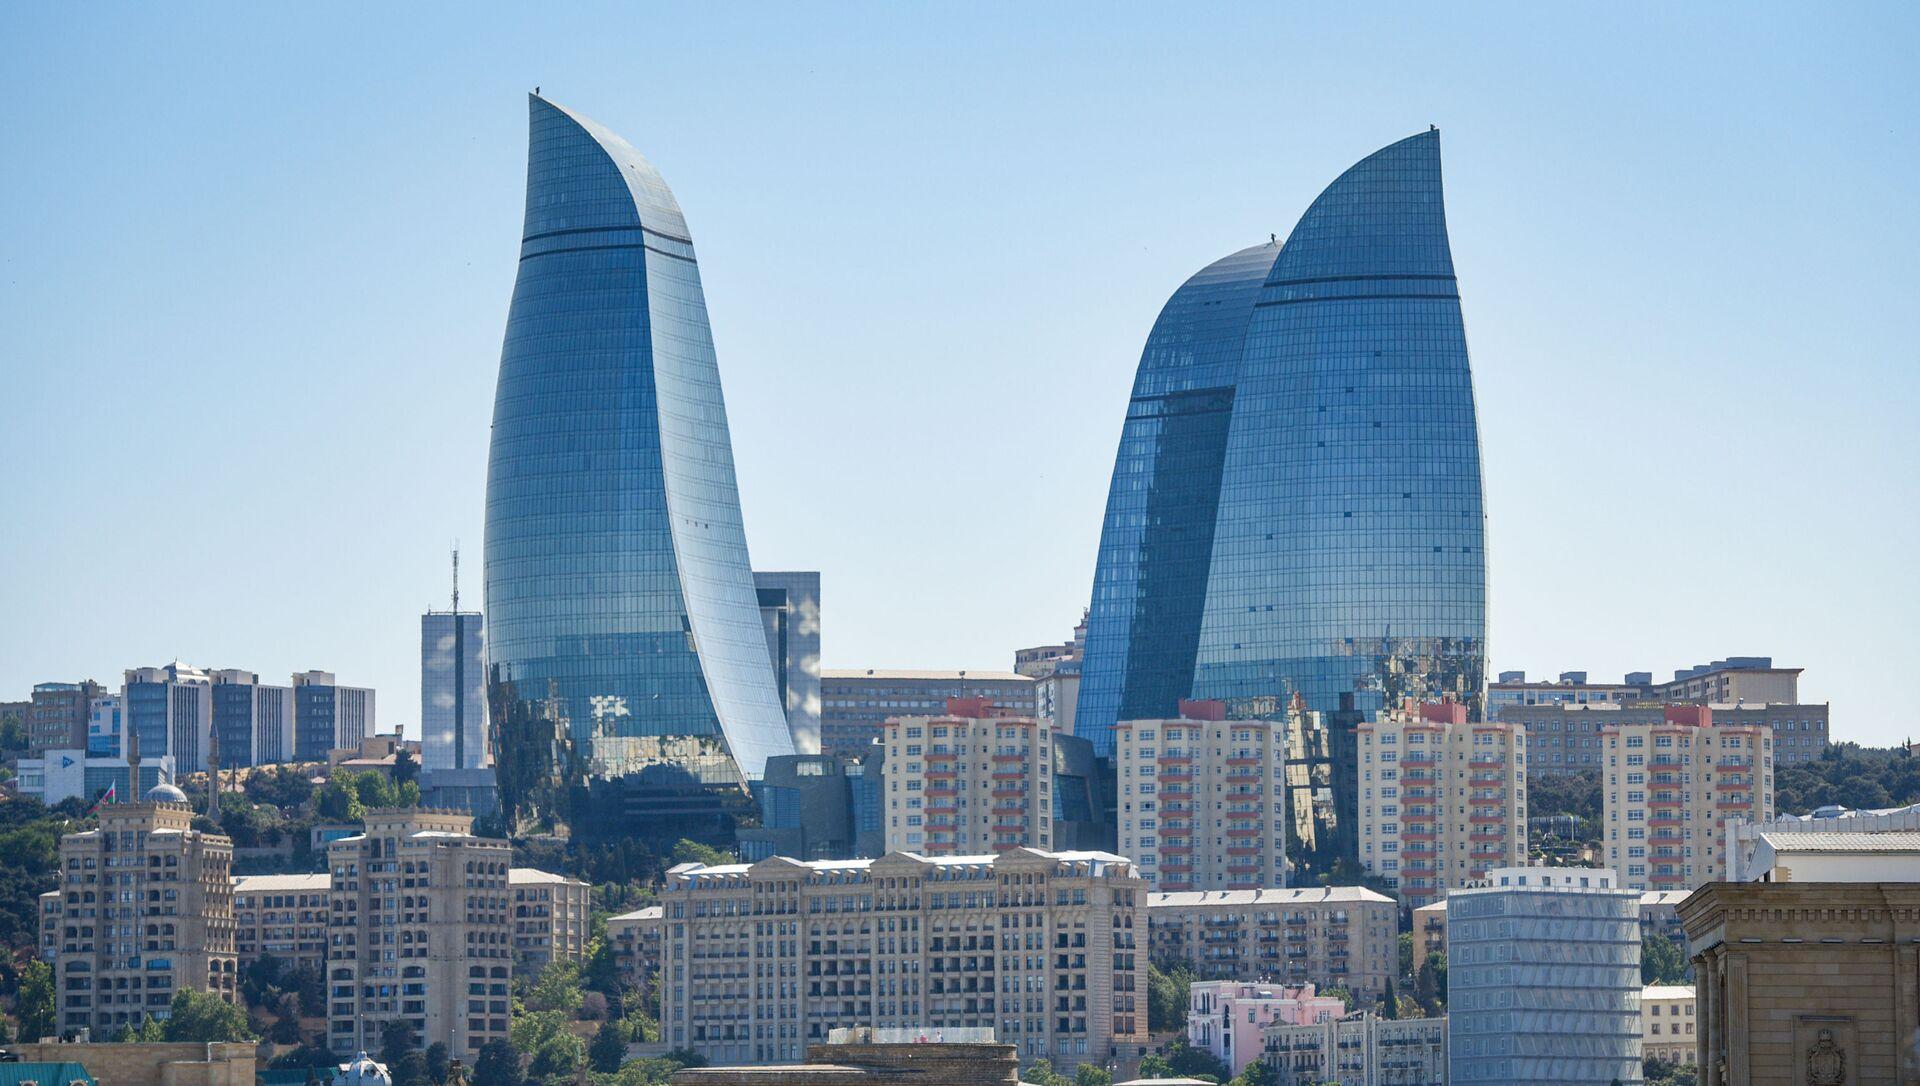 Вид на Flame Towers (Пламенные башни) в Баку, фото из архива - Sputnik Azərbaycan, 1920, 15.09.2021